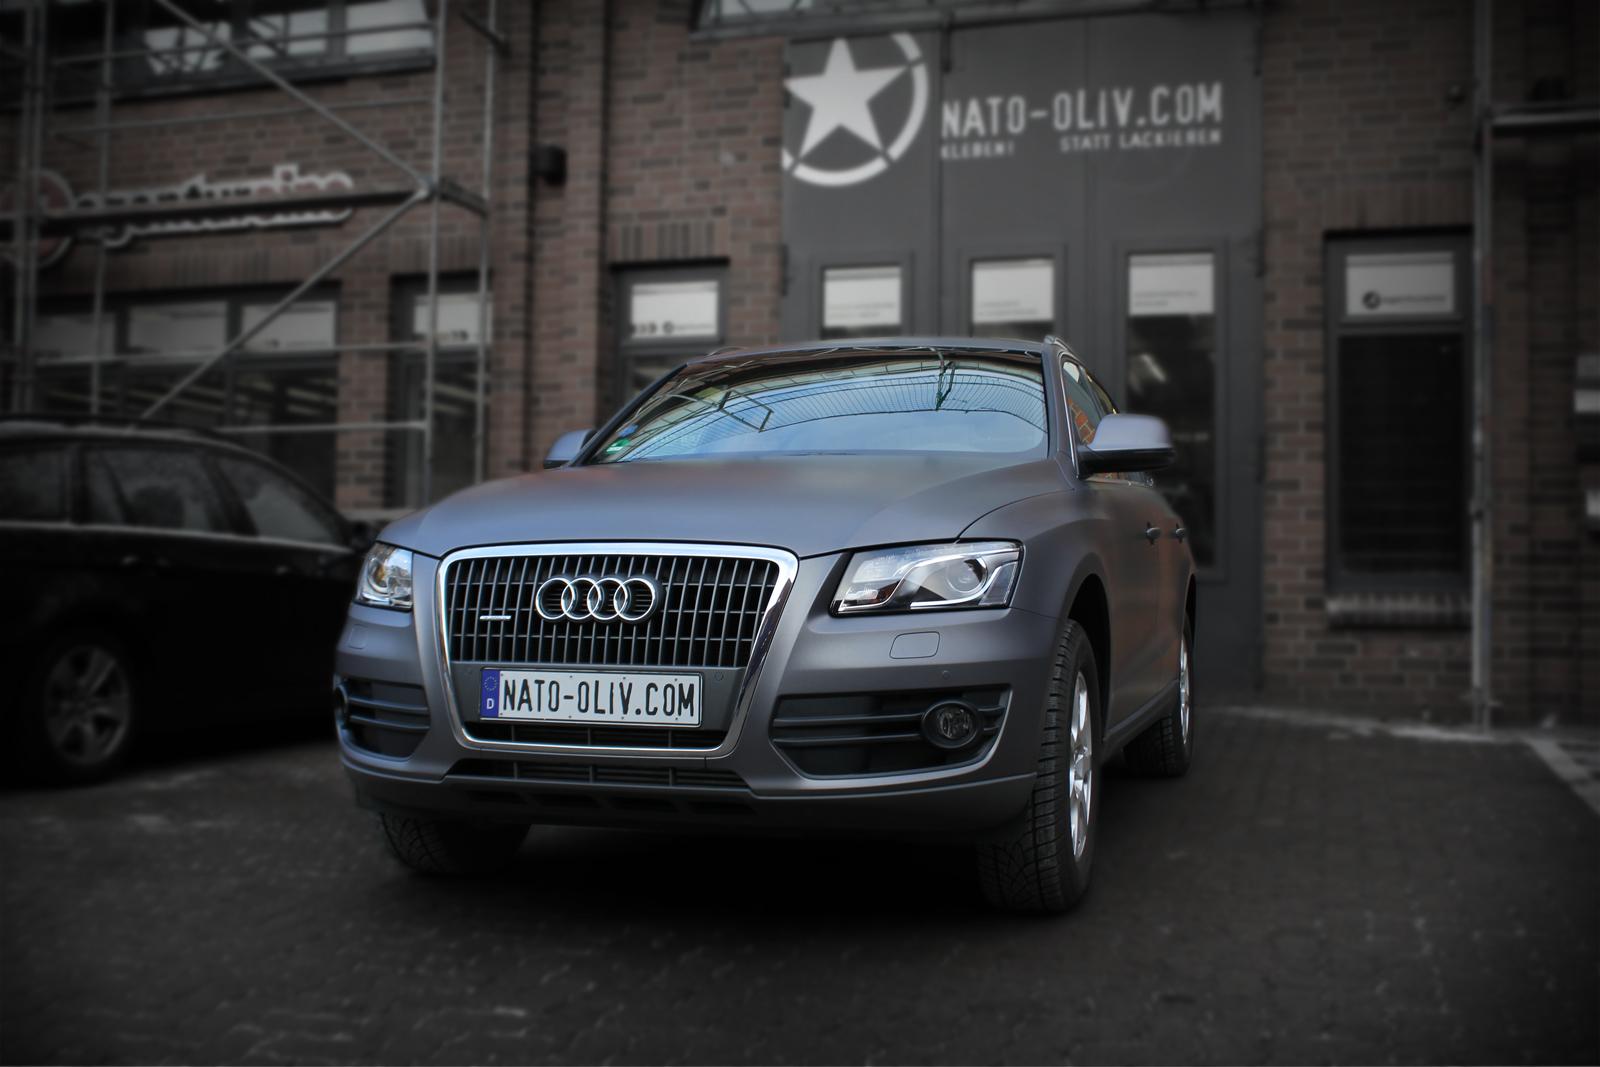 Audi_Q5_Folierung_Anthrazit_Matt_Metallic_Titelbild